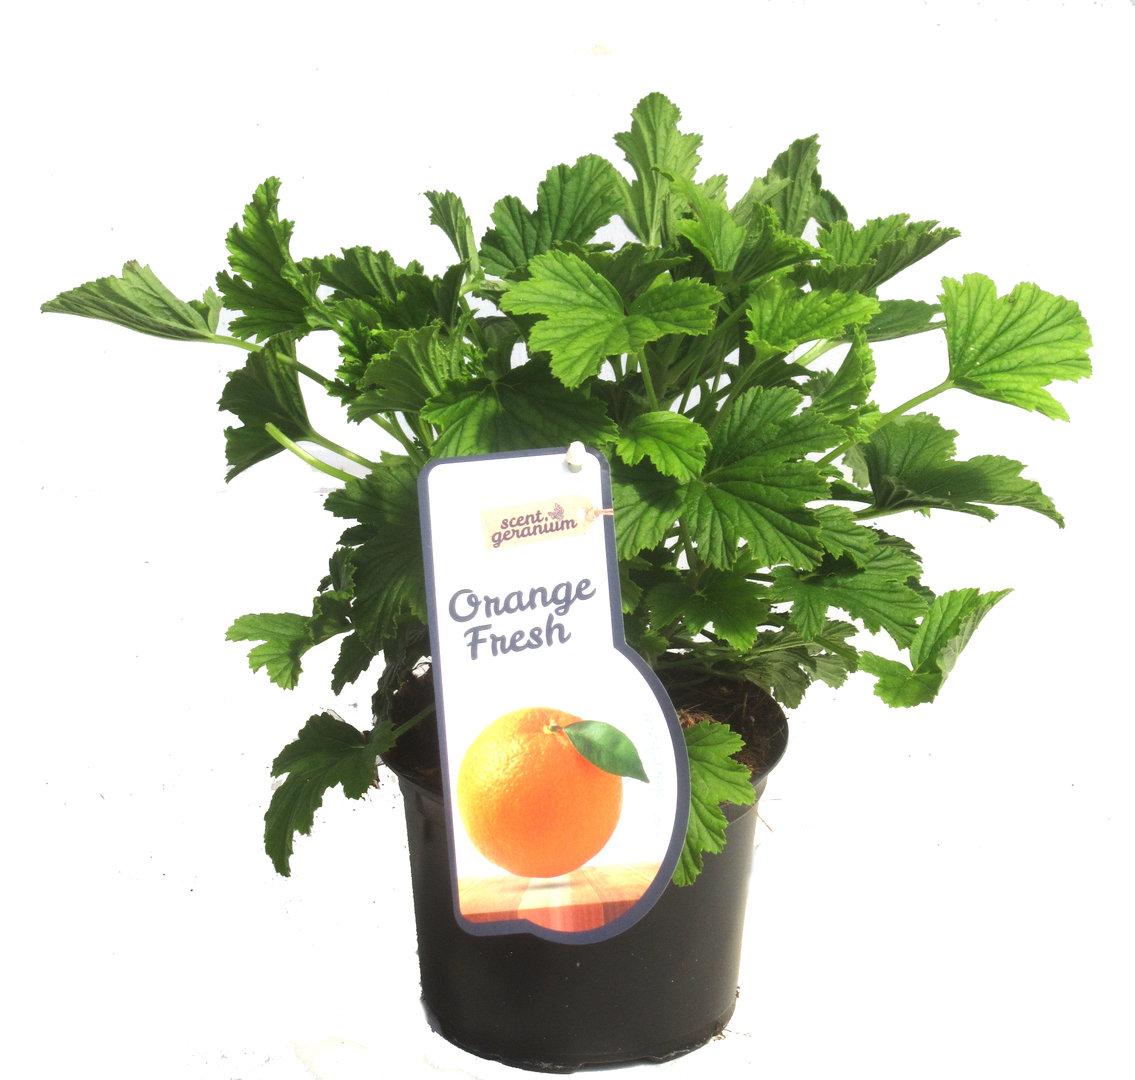 pelargonium pelargonium 39 orange fresh 39 duftgeranie pflanzen versand harro 39 s pflanzenwelt. Black Bedroom Furniture Sets. Home Design Ideas